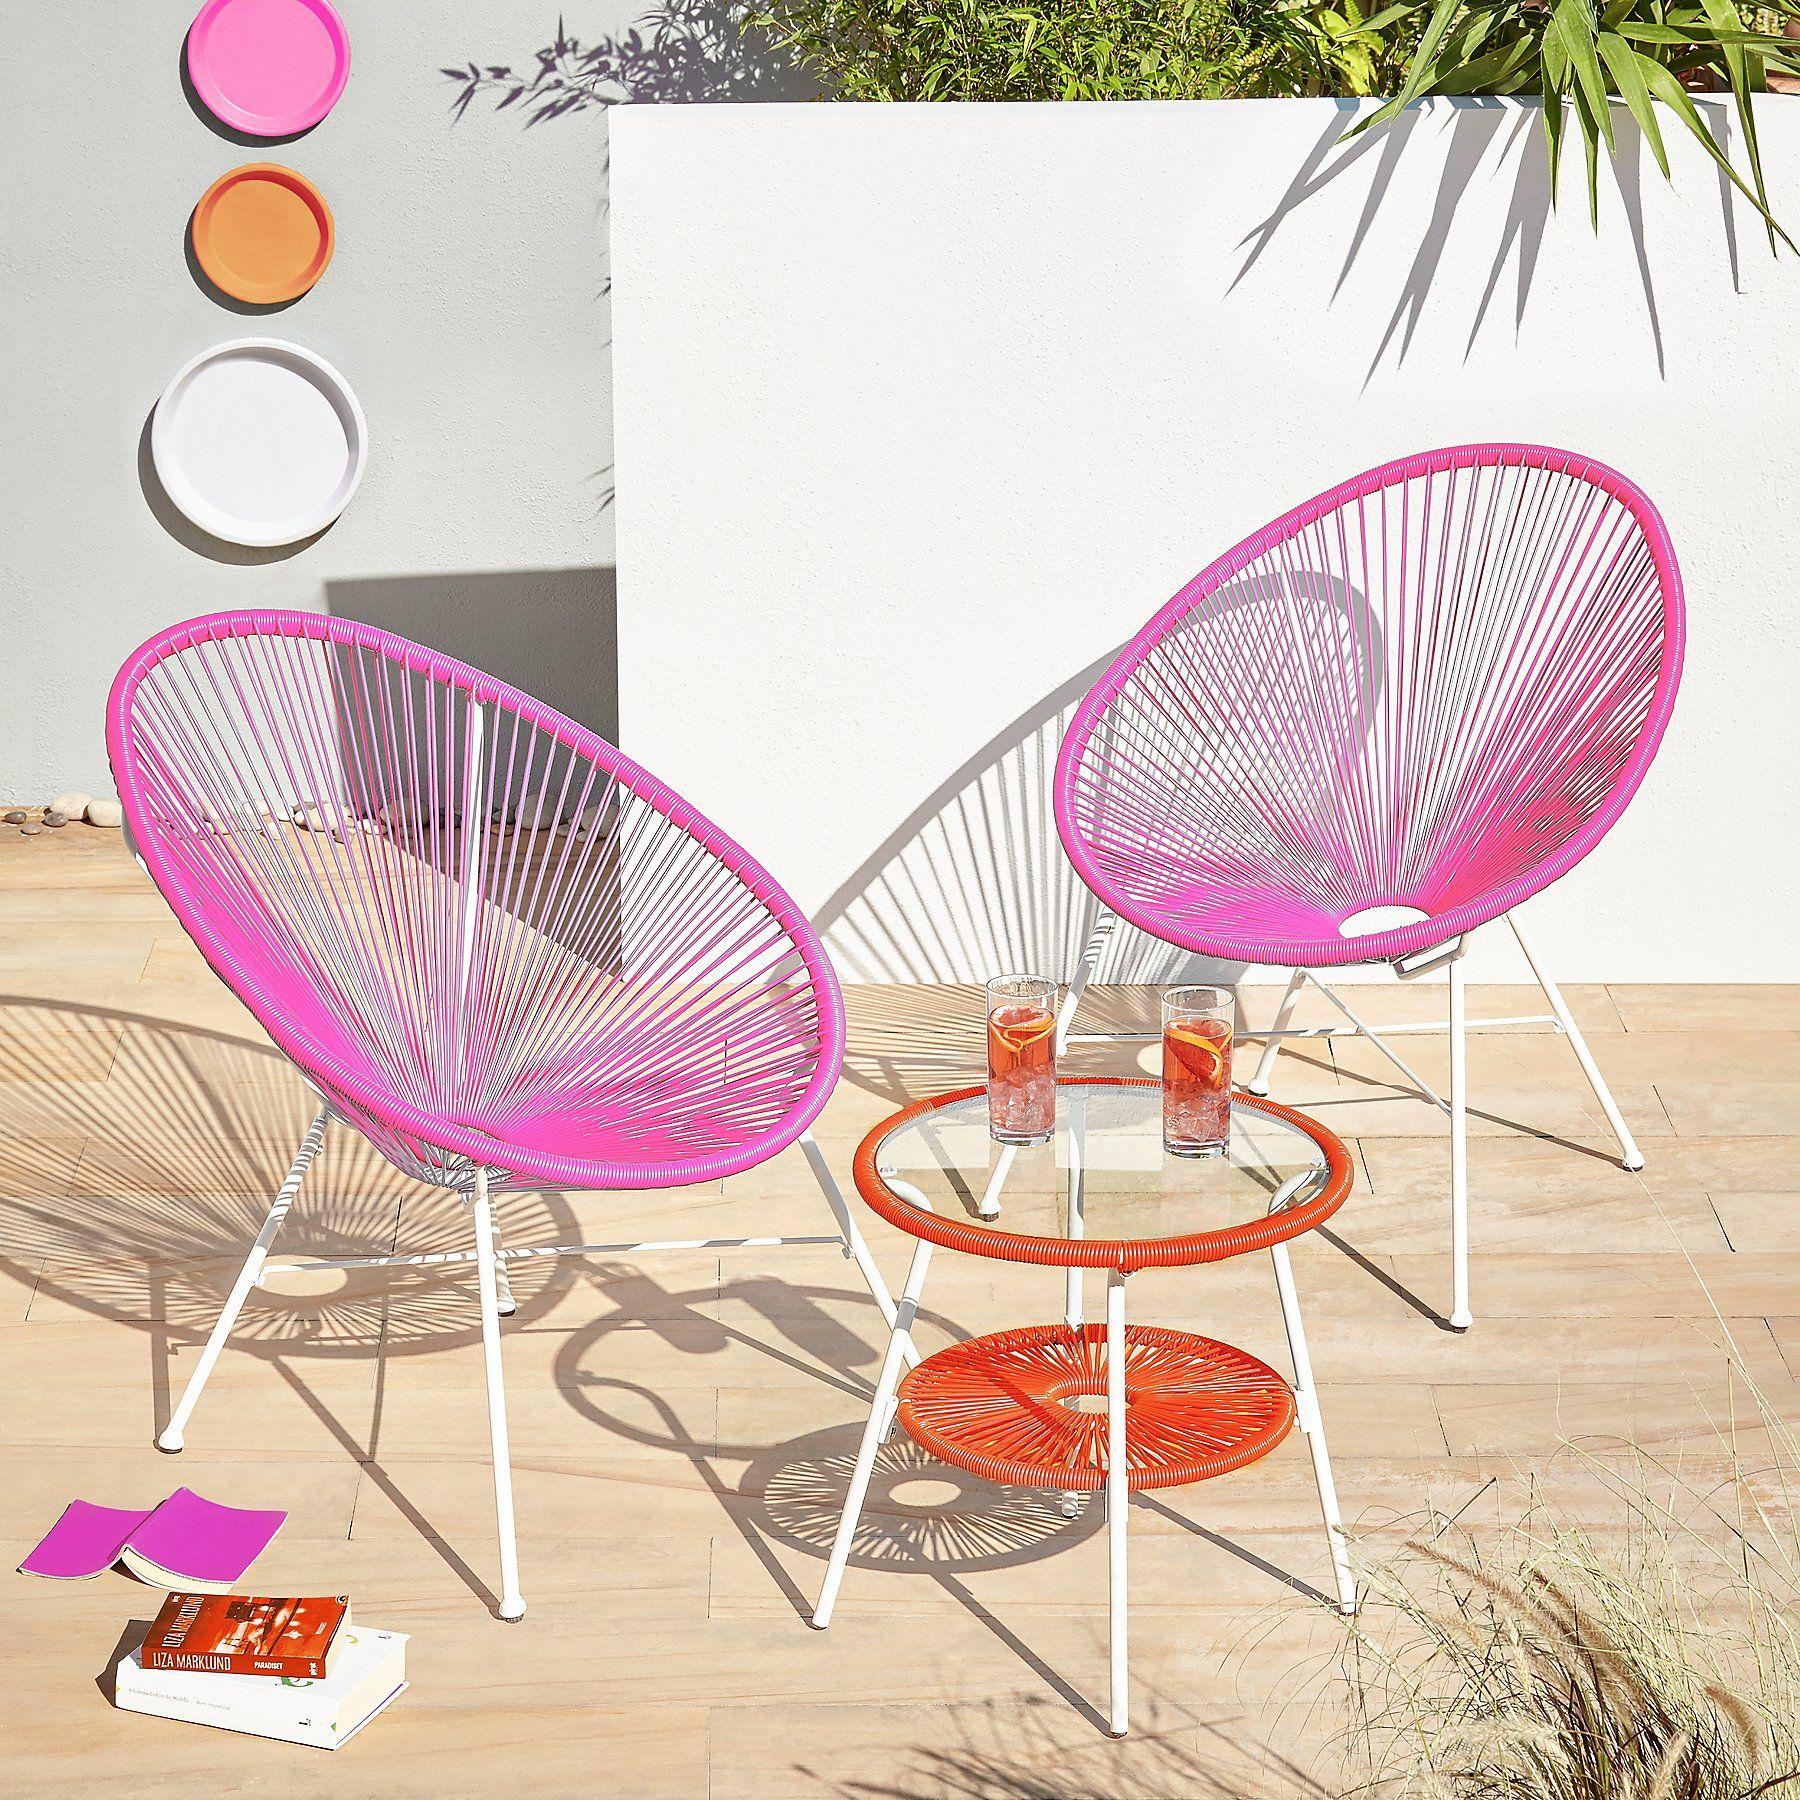 Camden 3 Piece Bistro Set Pink And Orange Home Garden George Bistro Set 3 Piece Bistro Set Outdoor Patio Furniture Sets